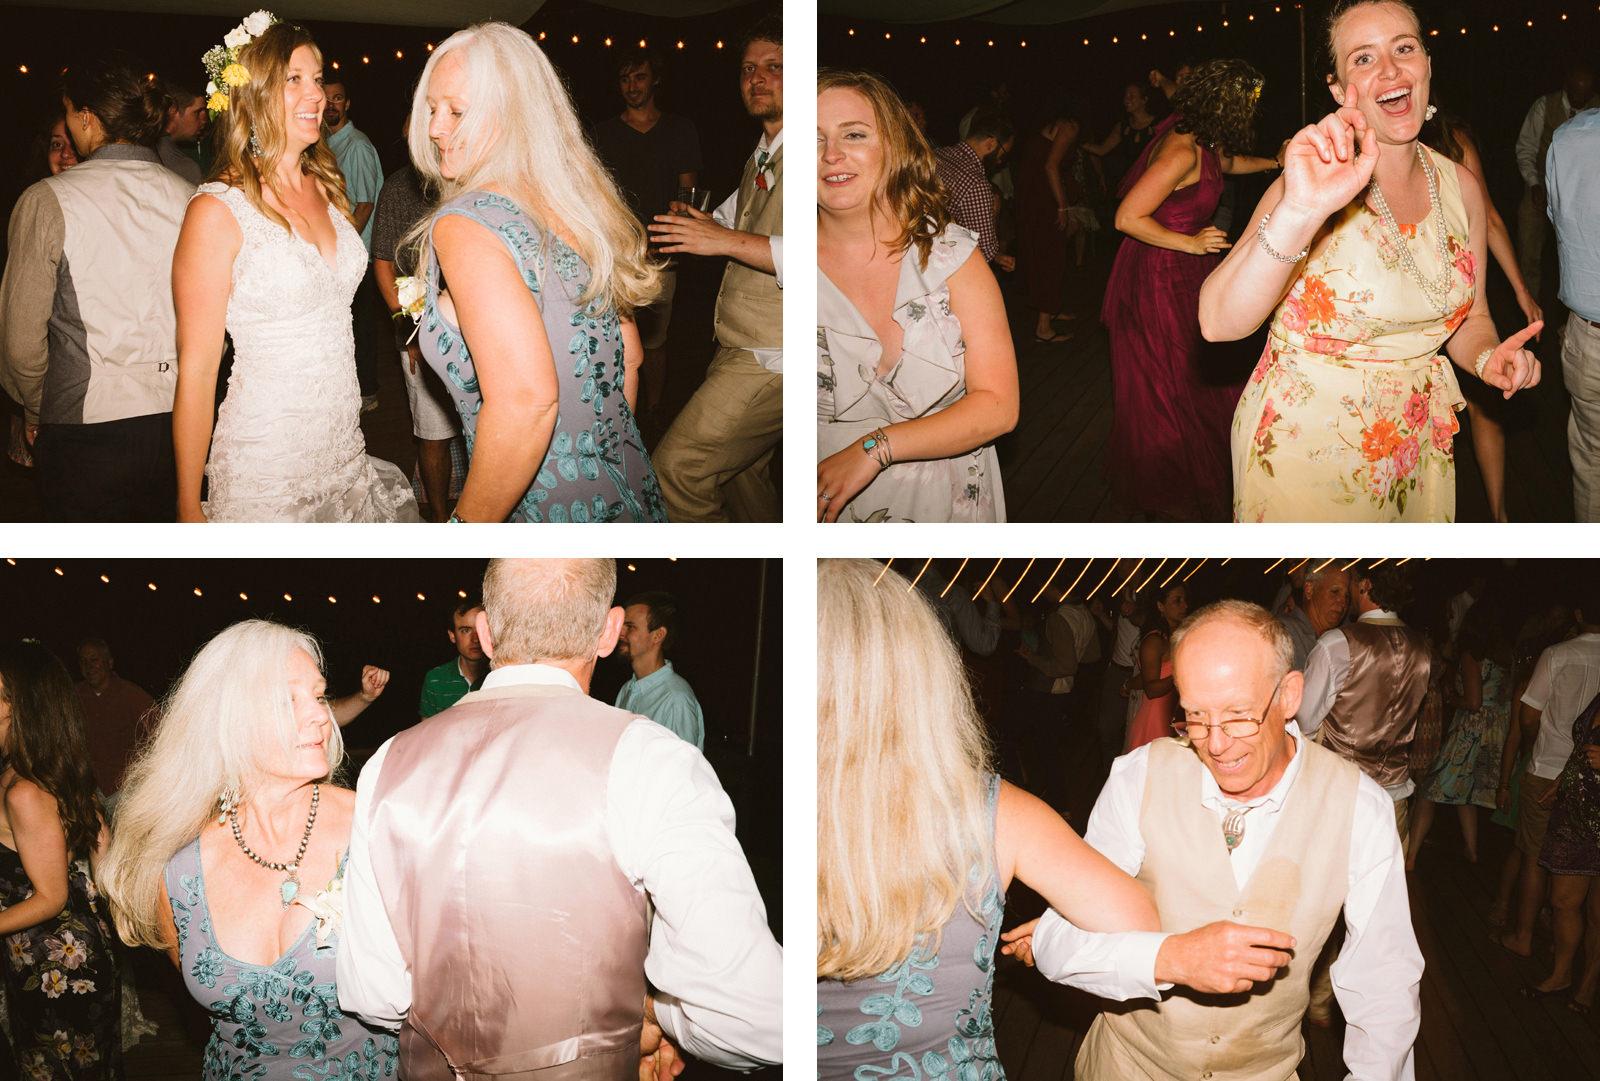 rivers-bend-retreat-wedding-117 RIVER'S BEND RETREAT WEDDING